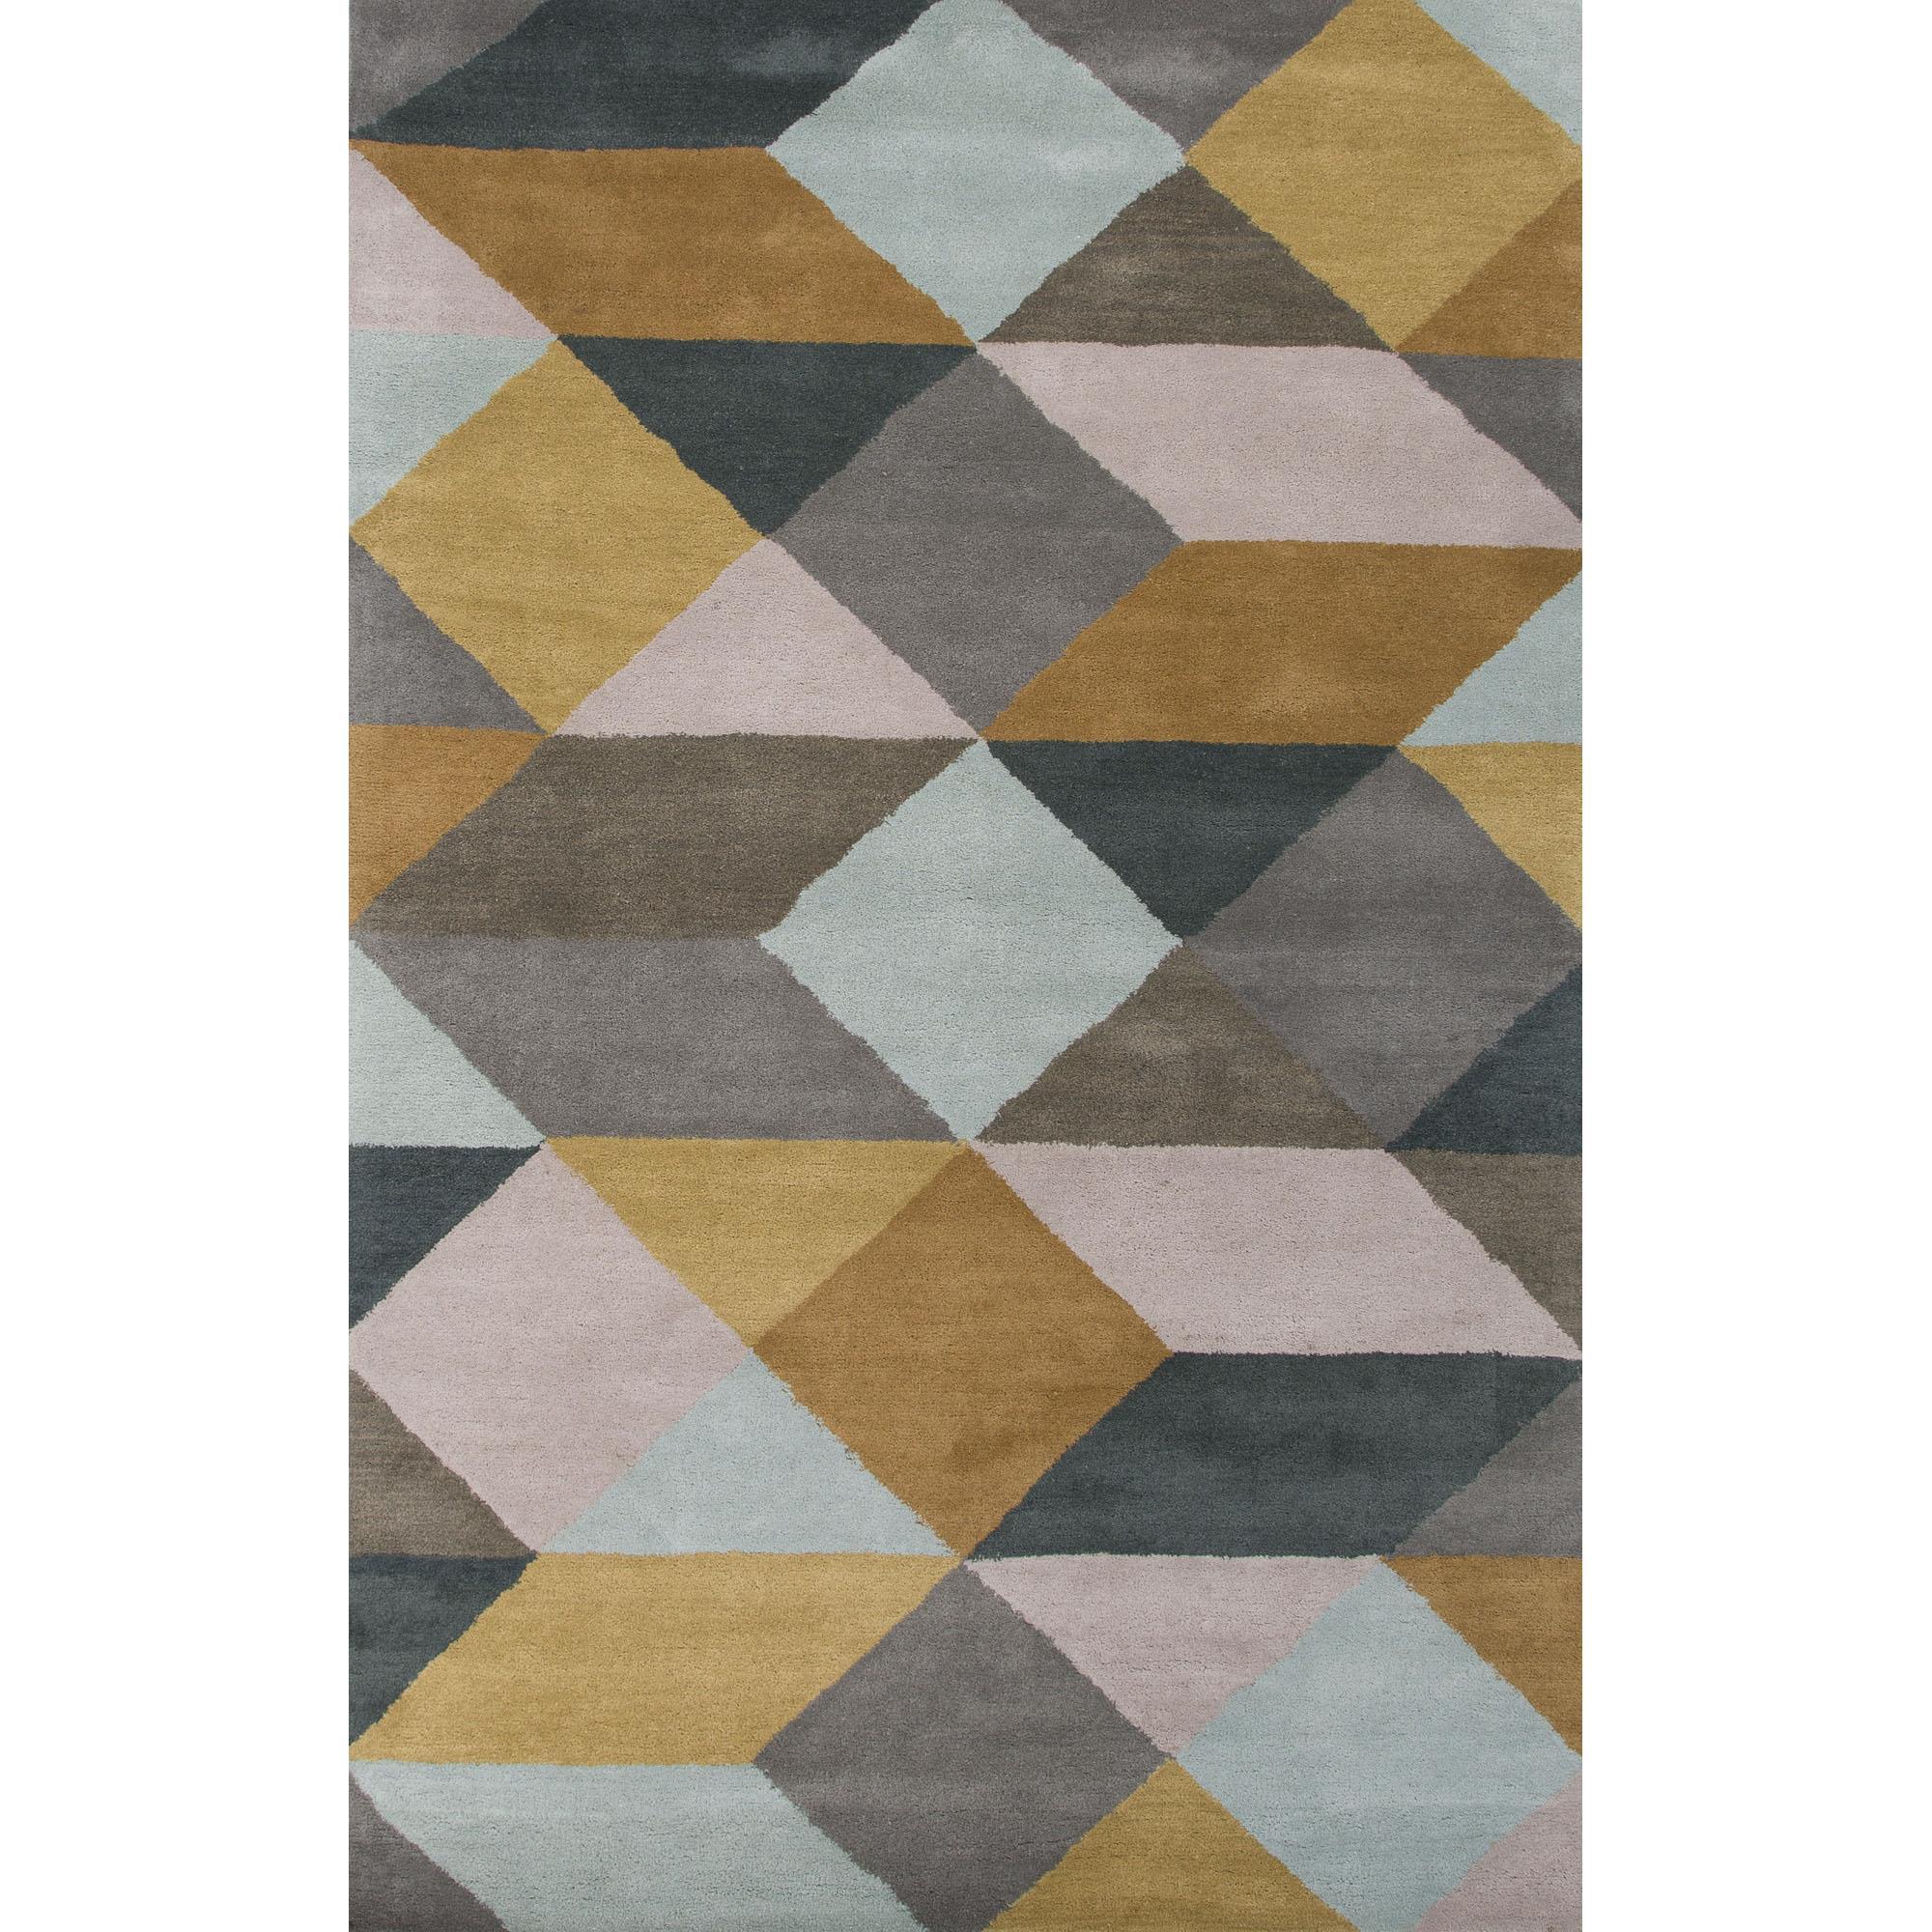 JAIPUR Rugs En Casa By Luli Sanchez Tufted 5 x 8 Rug - Item Number: RUG115834